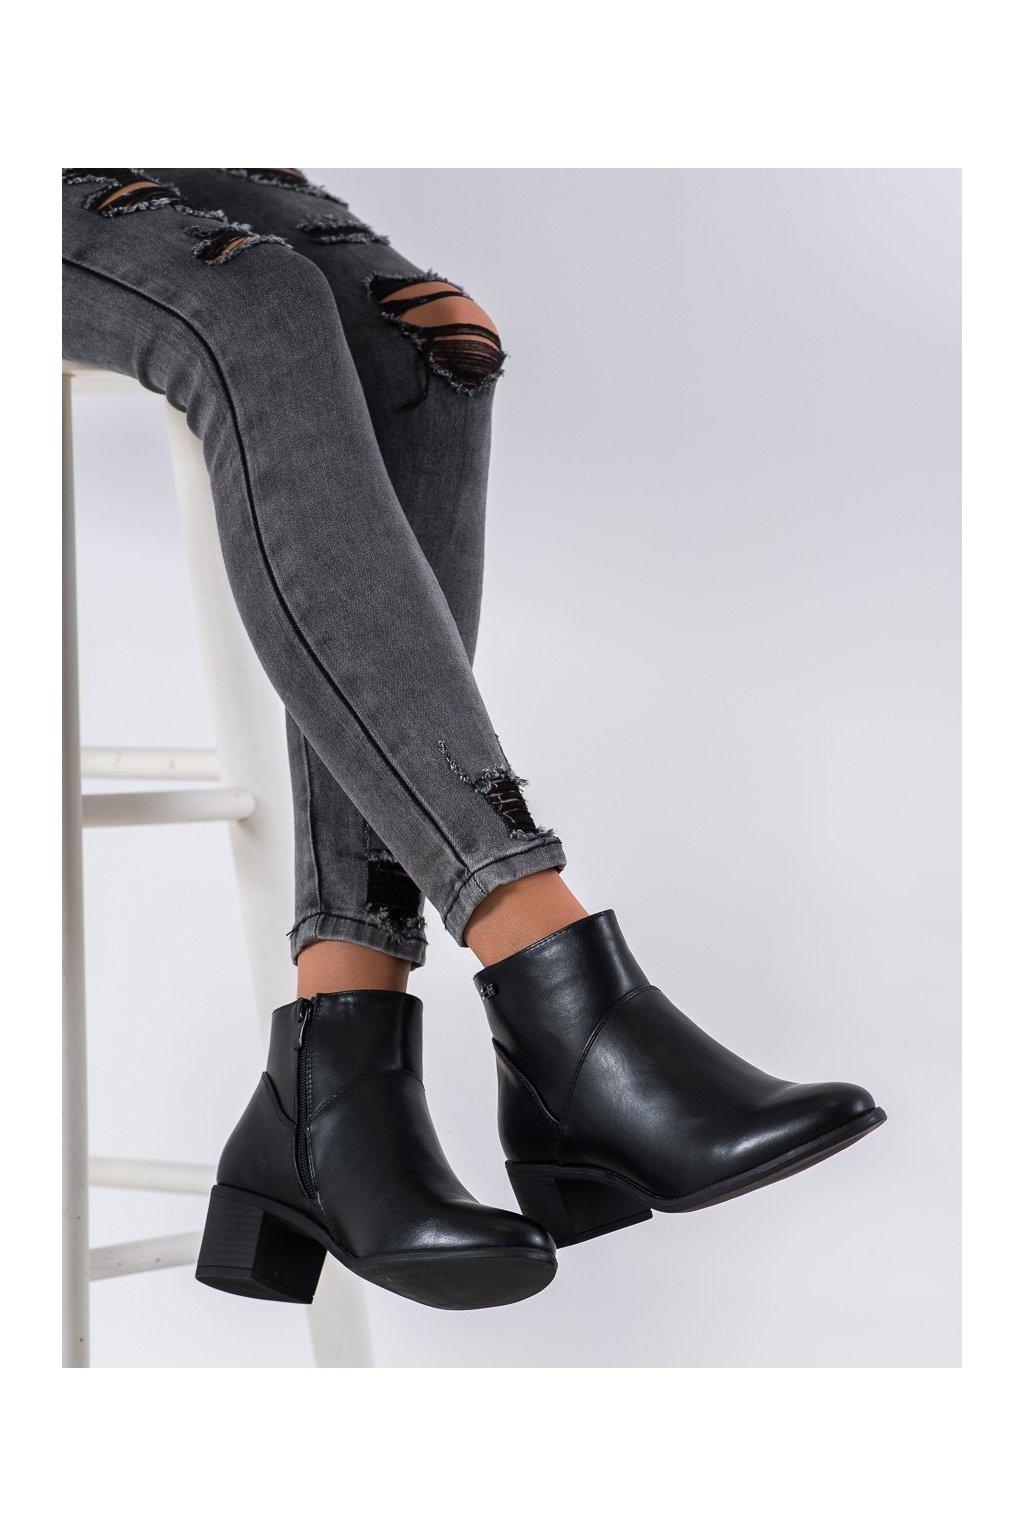 Čierne dámske topánky Sergio leone kod BT507B